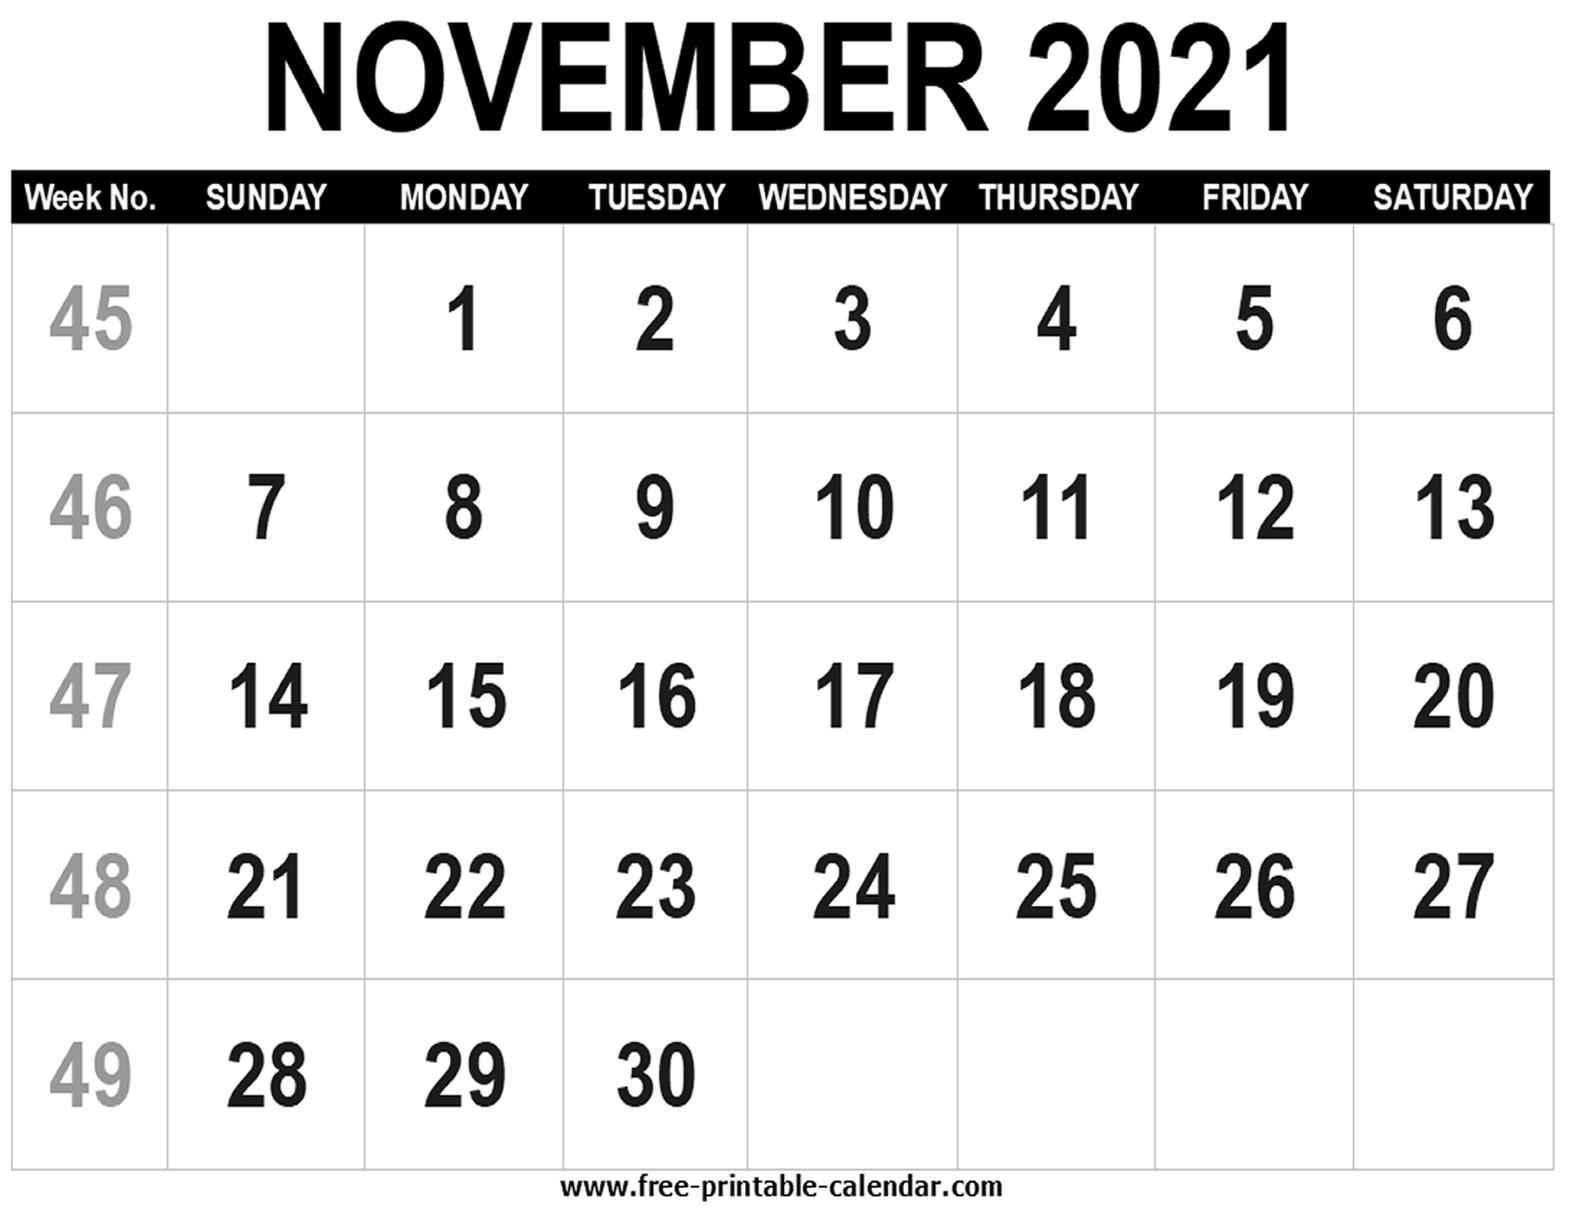 Blank Calendar 2021 November - Free-Printable-Calendar Free Printable November 2021 Calendar With Holidays